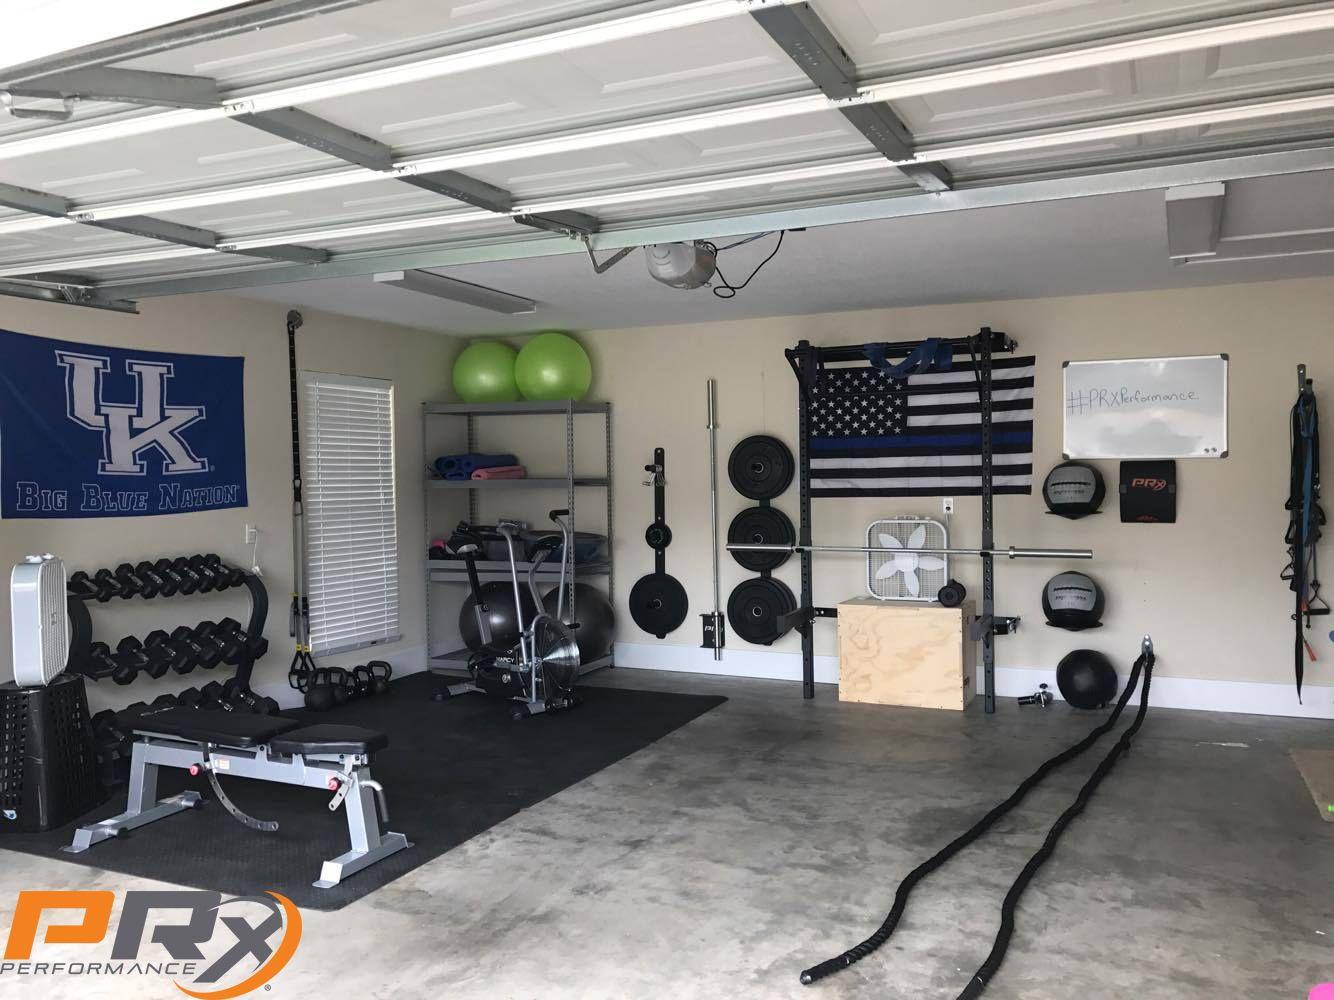 Extreme Home Makeover Garage Gym Edition Home Gym Basement Small Home Gyms Home Gym Decor